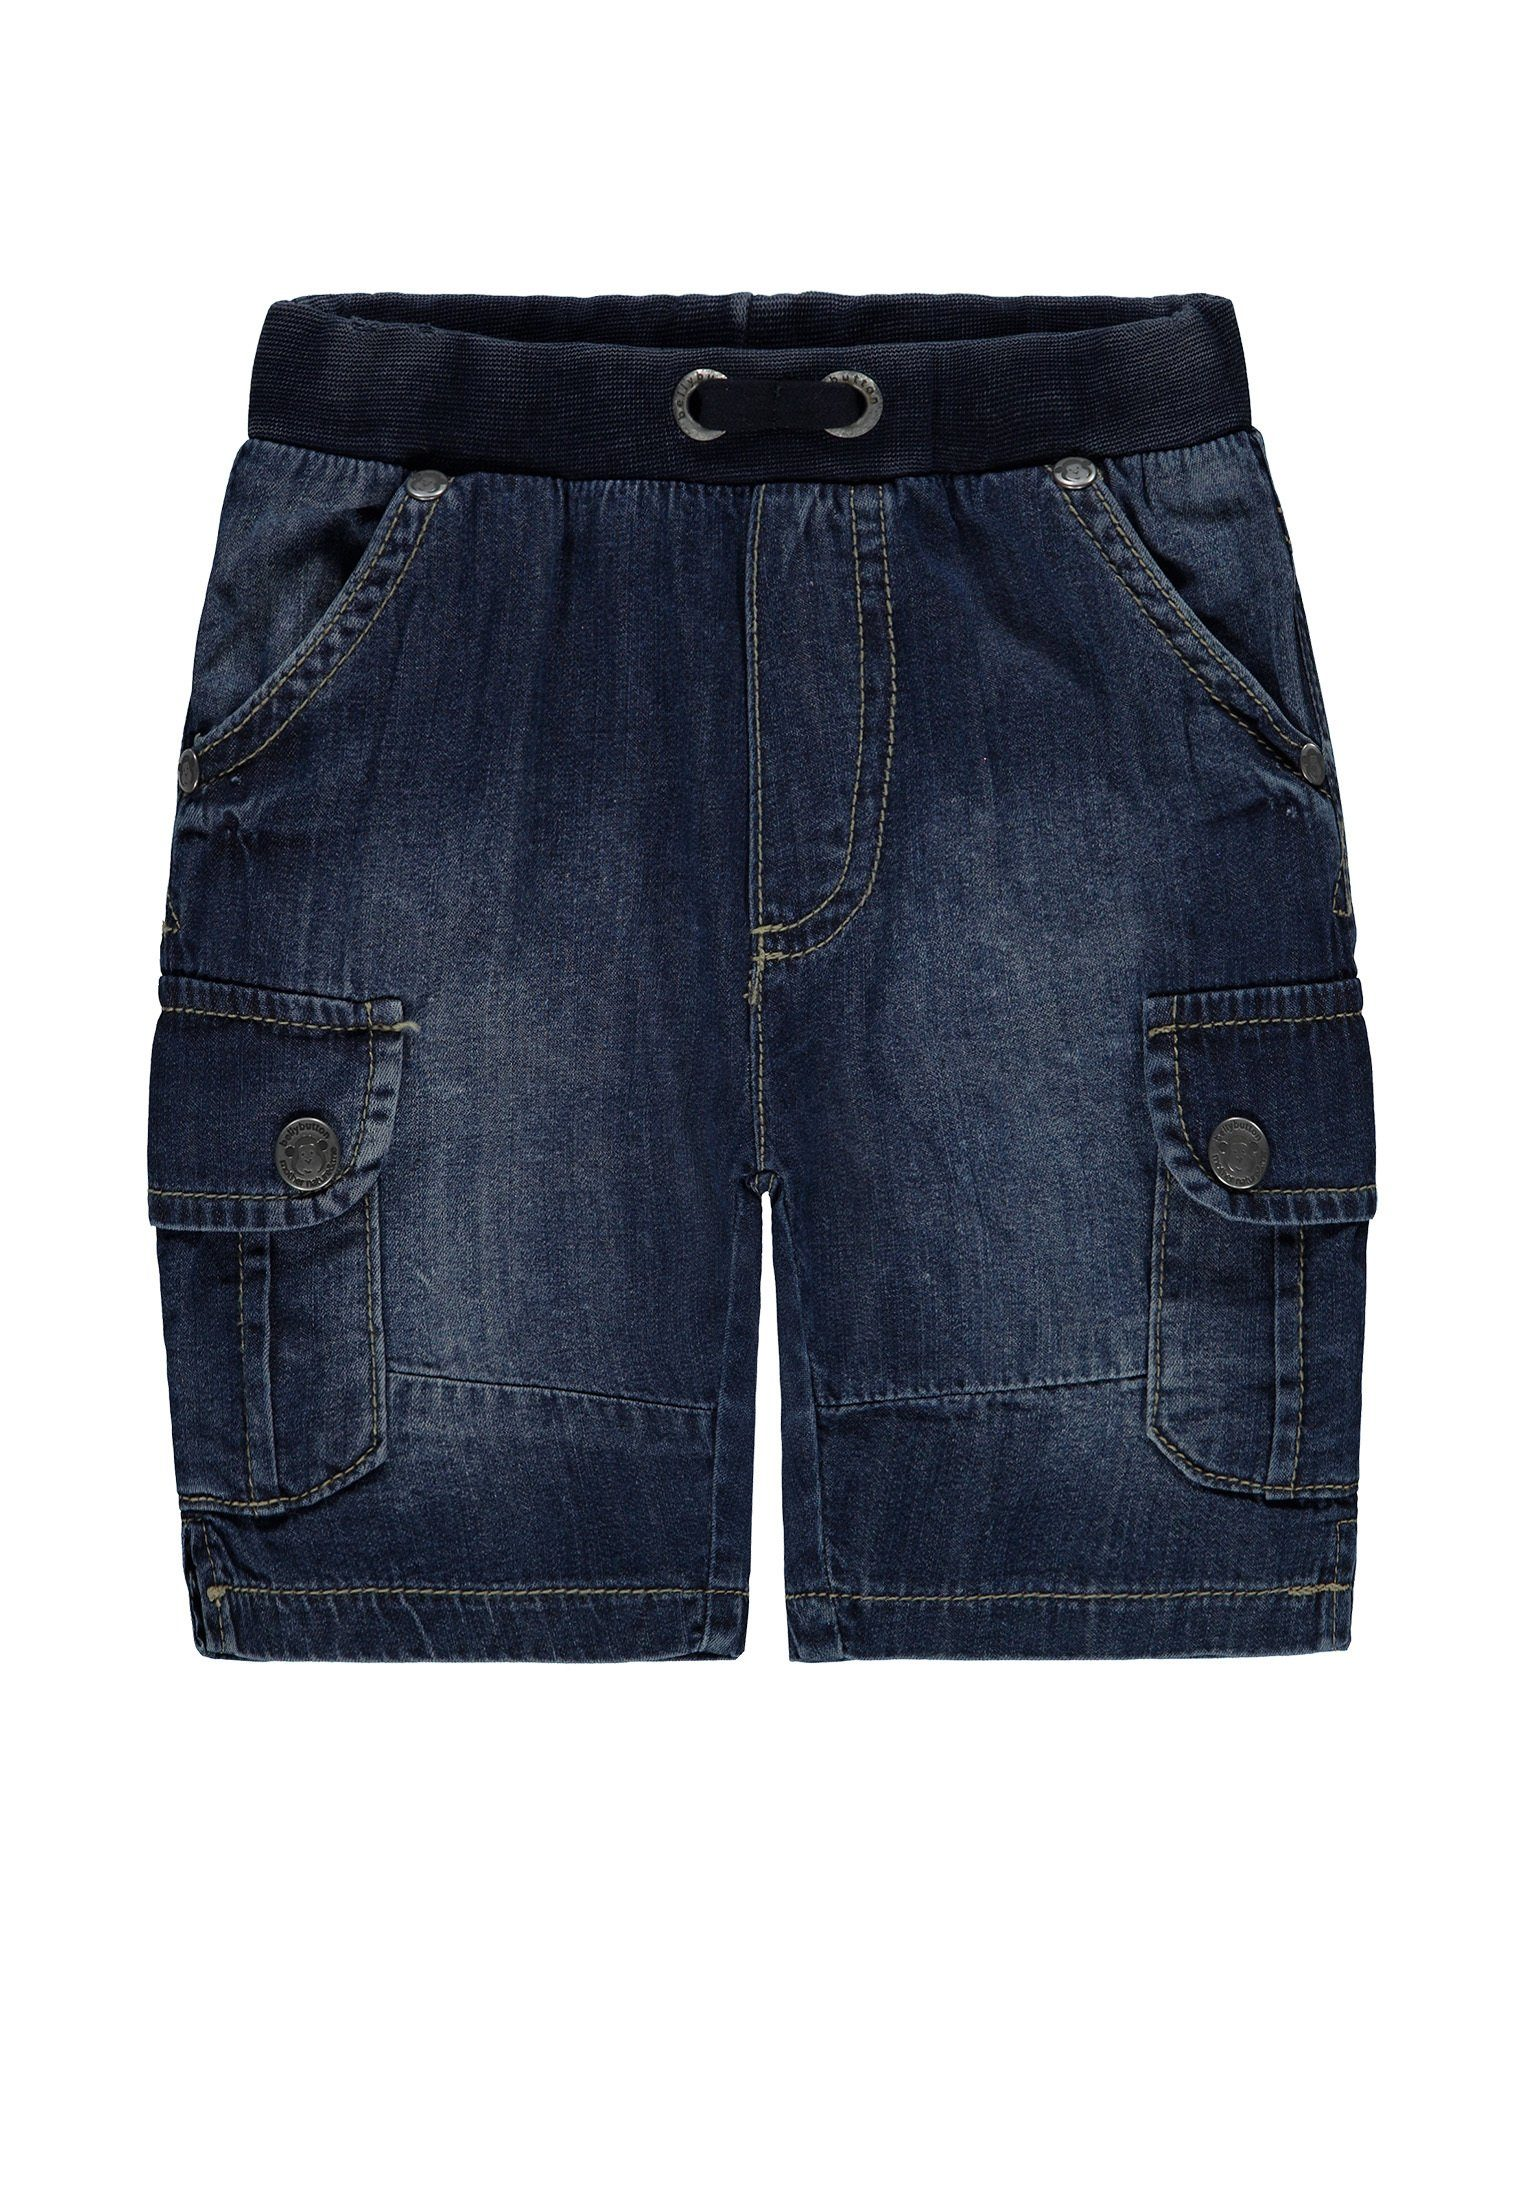 Image of Bellybutton Bermudas, Jeans, Cargo